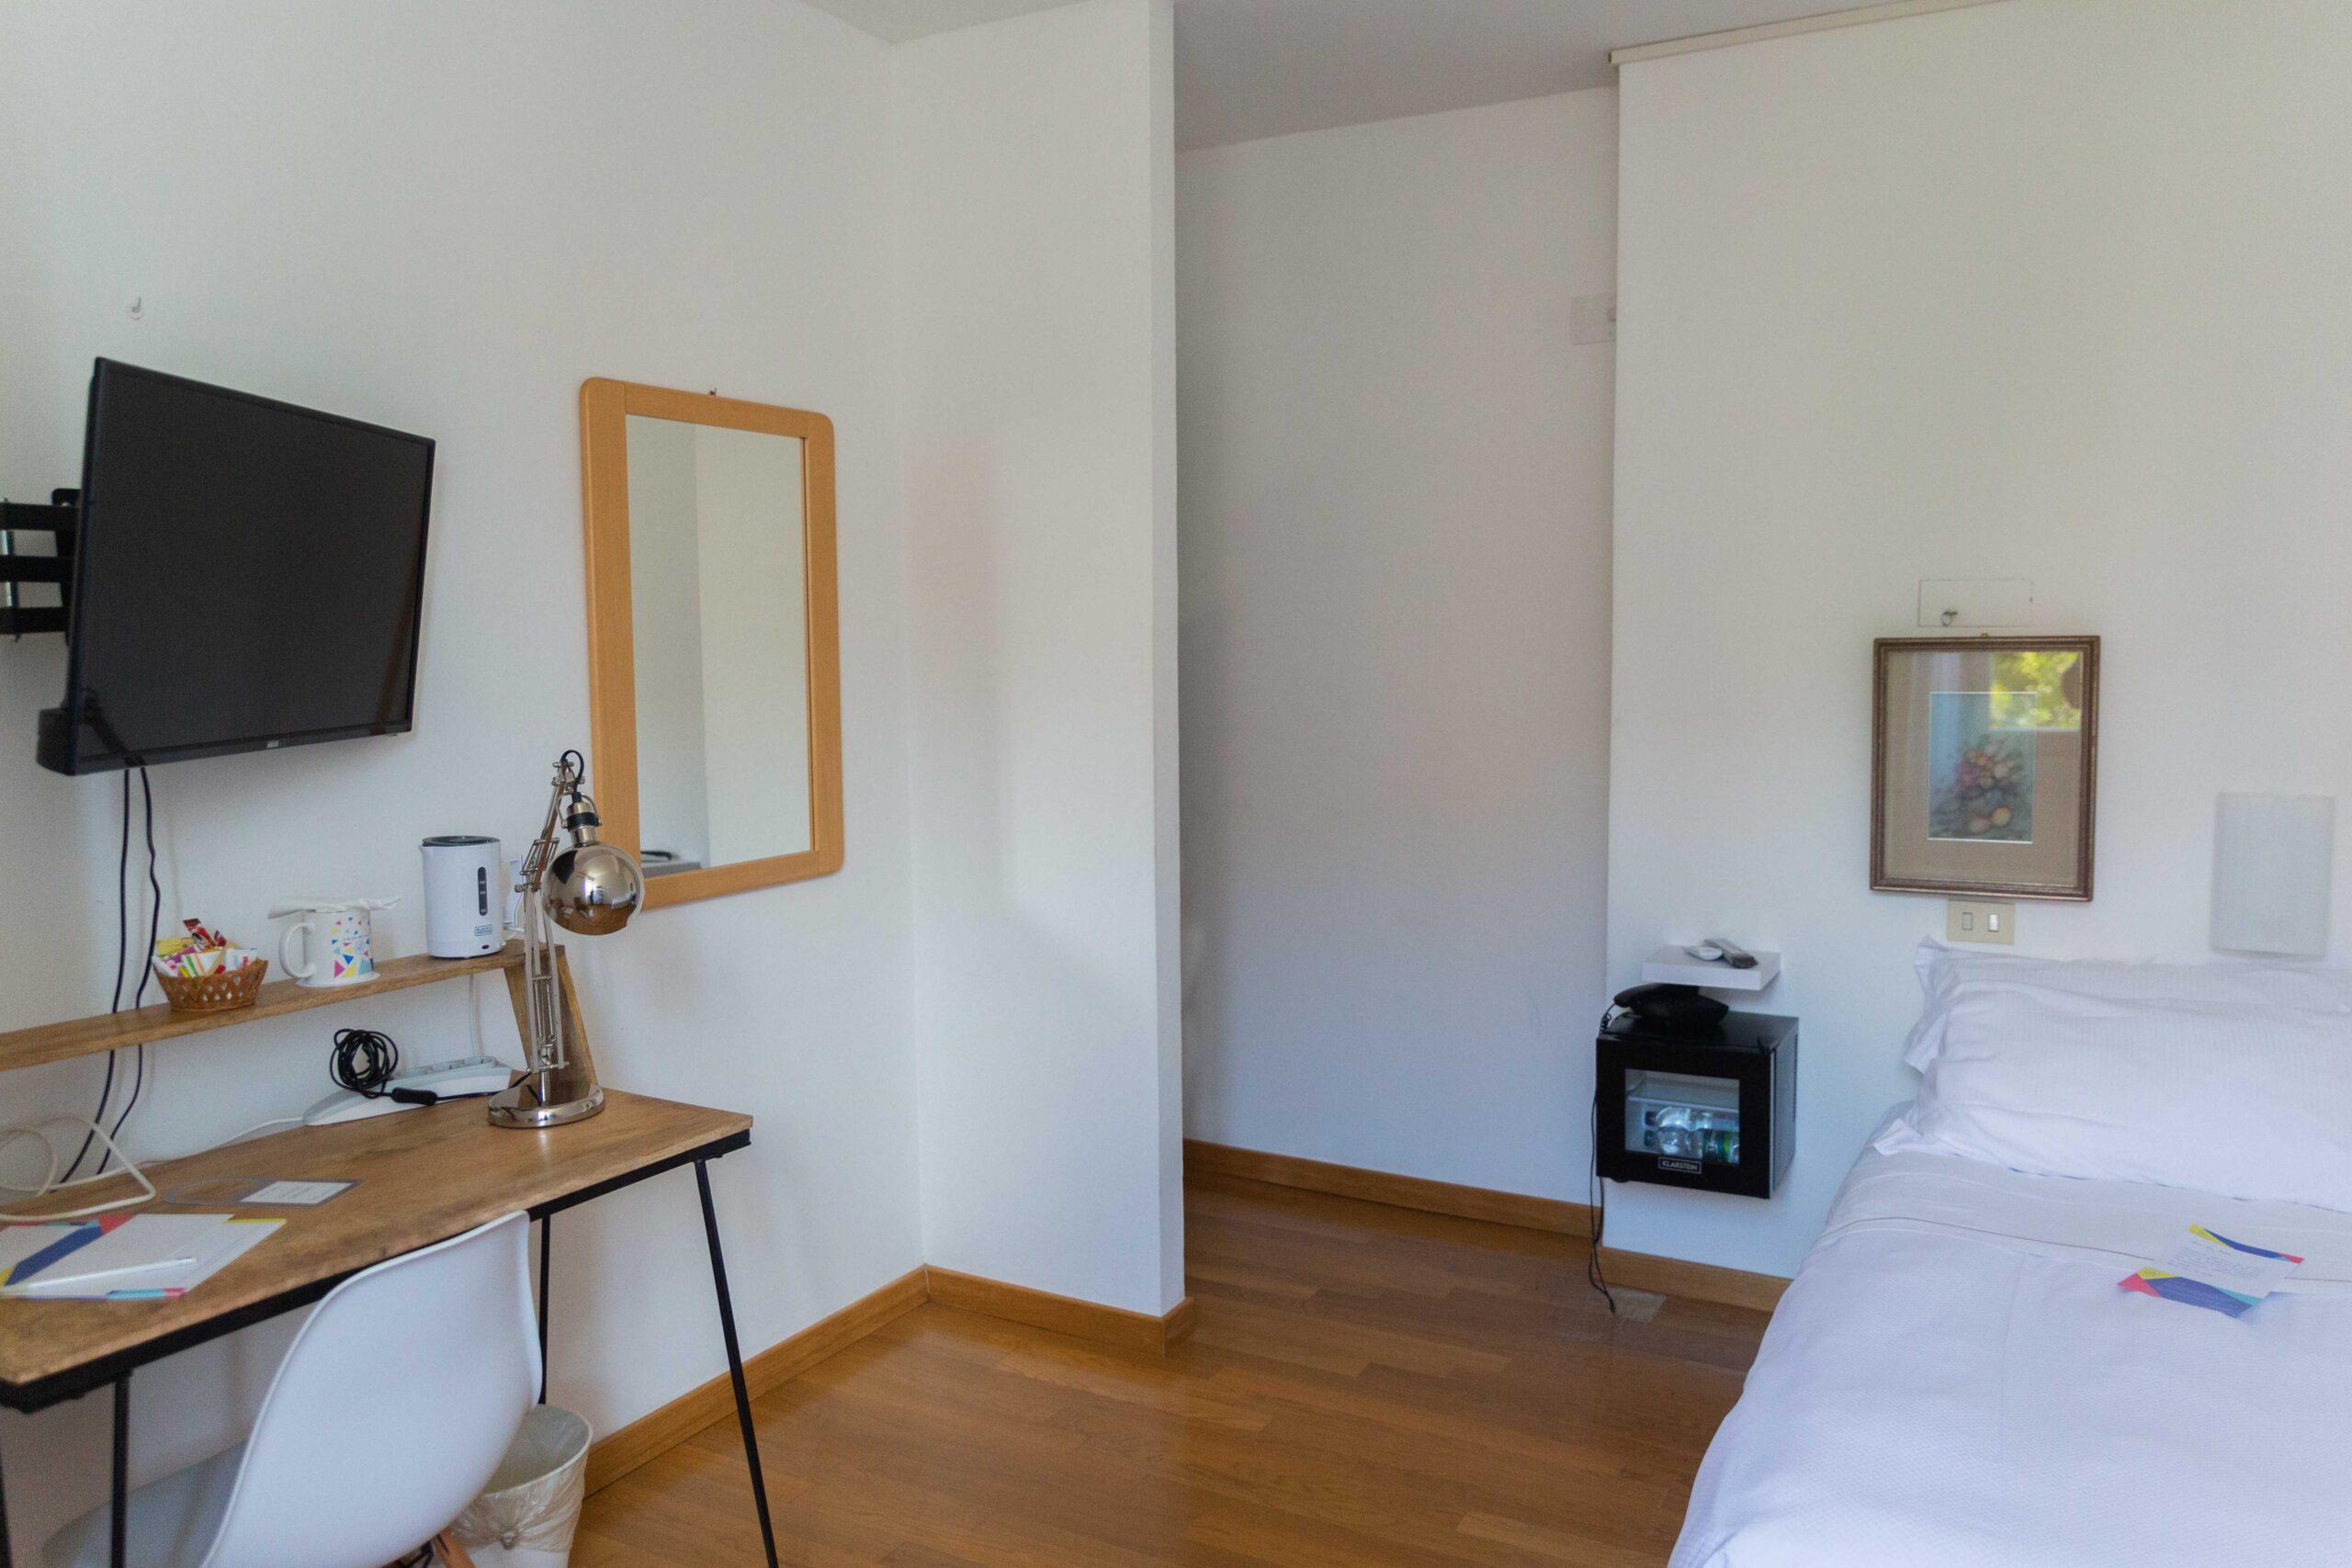 Economy Hotel San Michele 4 Stelle   San Michele Celle Ligure